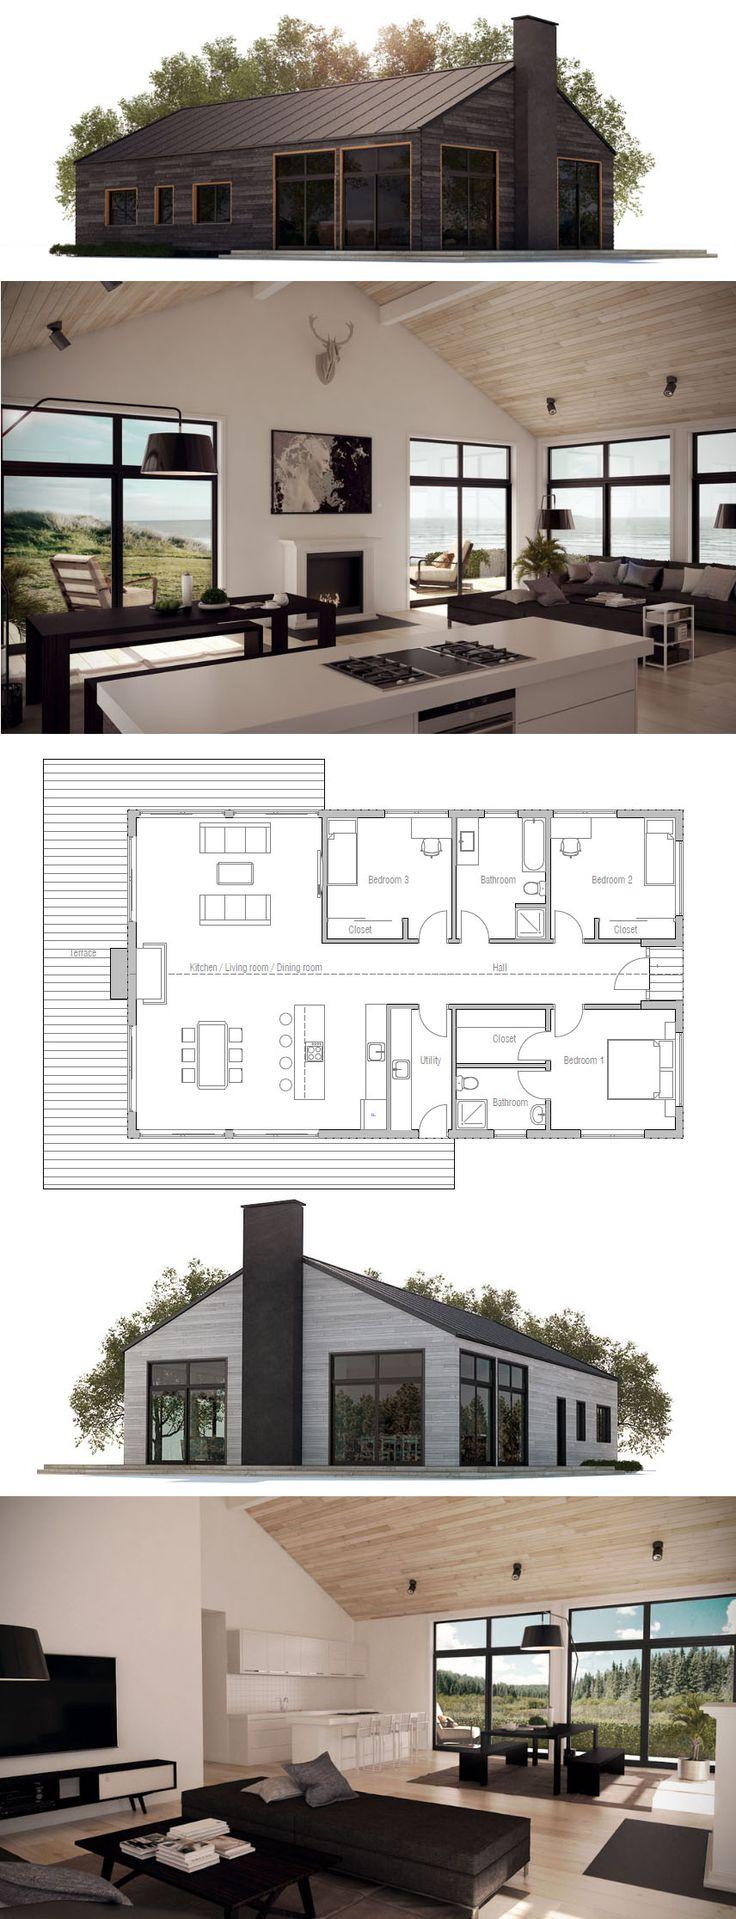 Erdgeschoss haus front design  best Одноэтажный дом images on pinterest  house floor plans